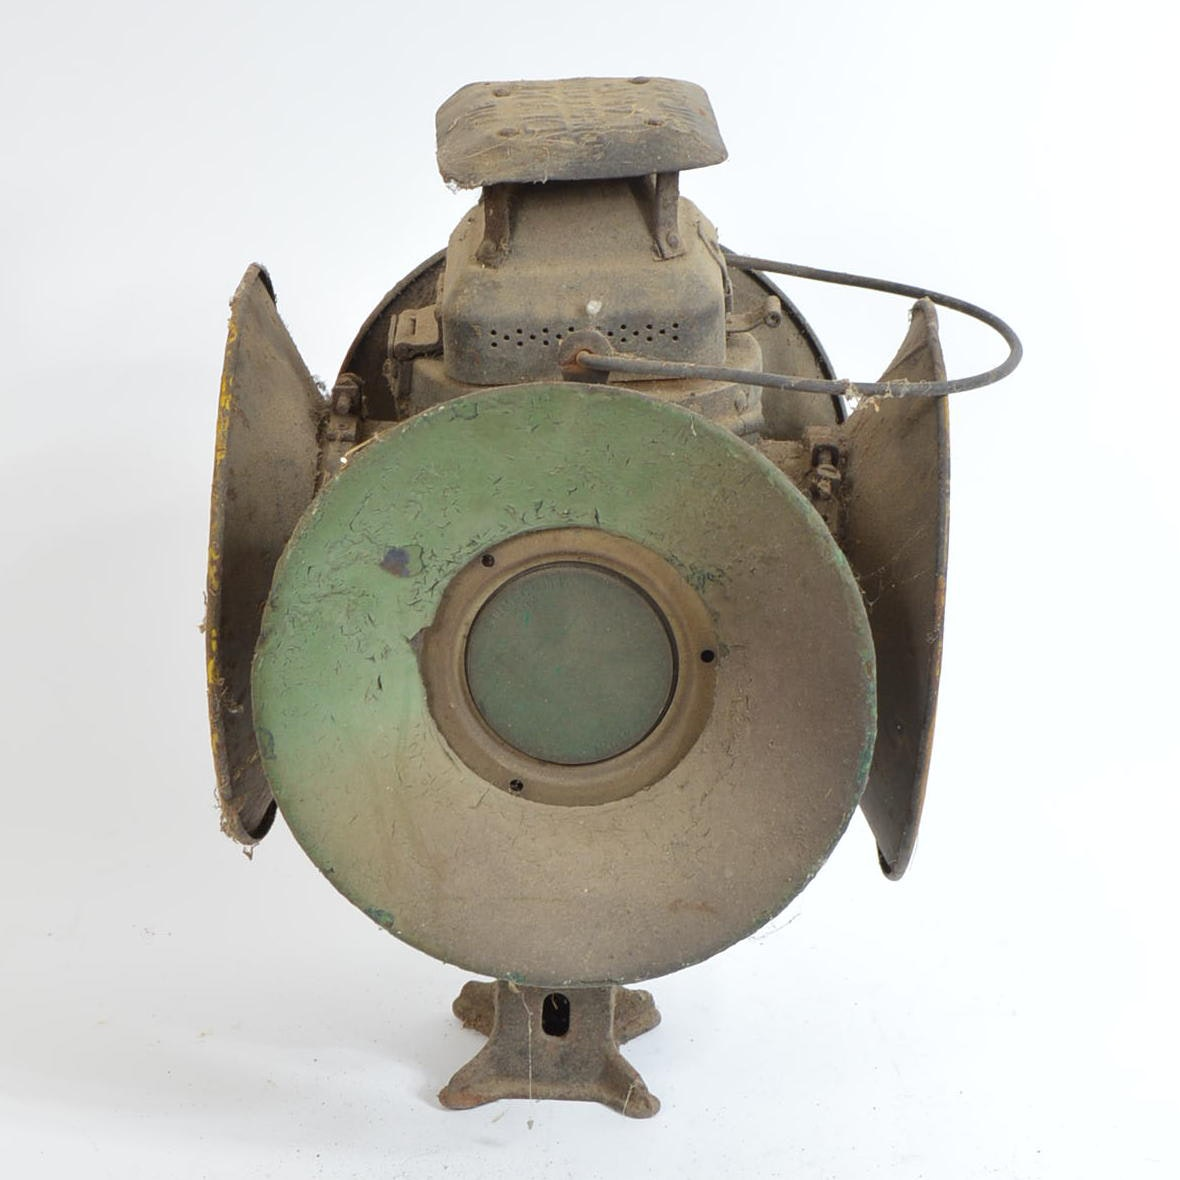 Antique Adlake Railroad Lantern